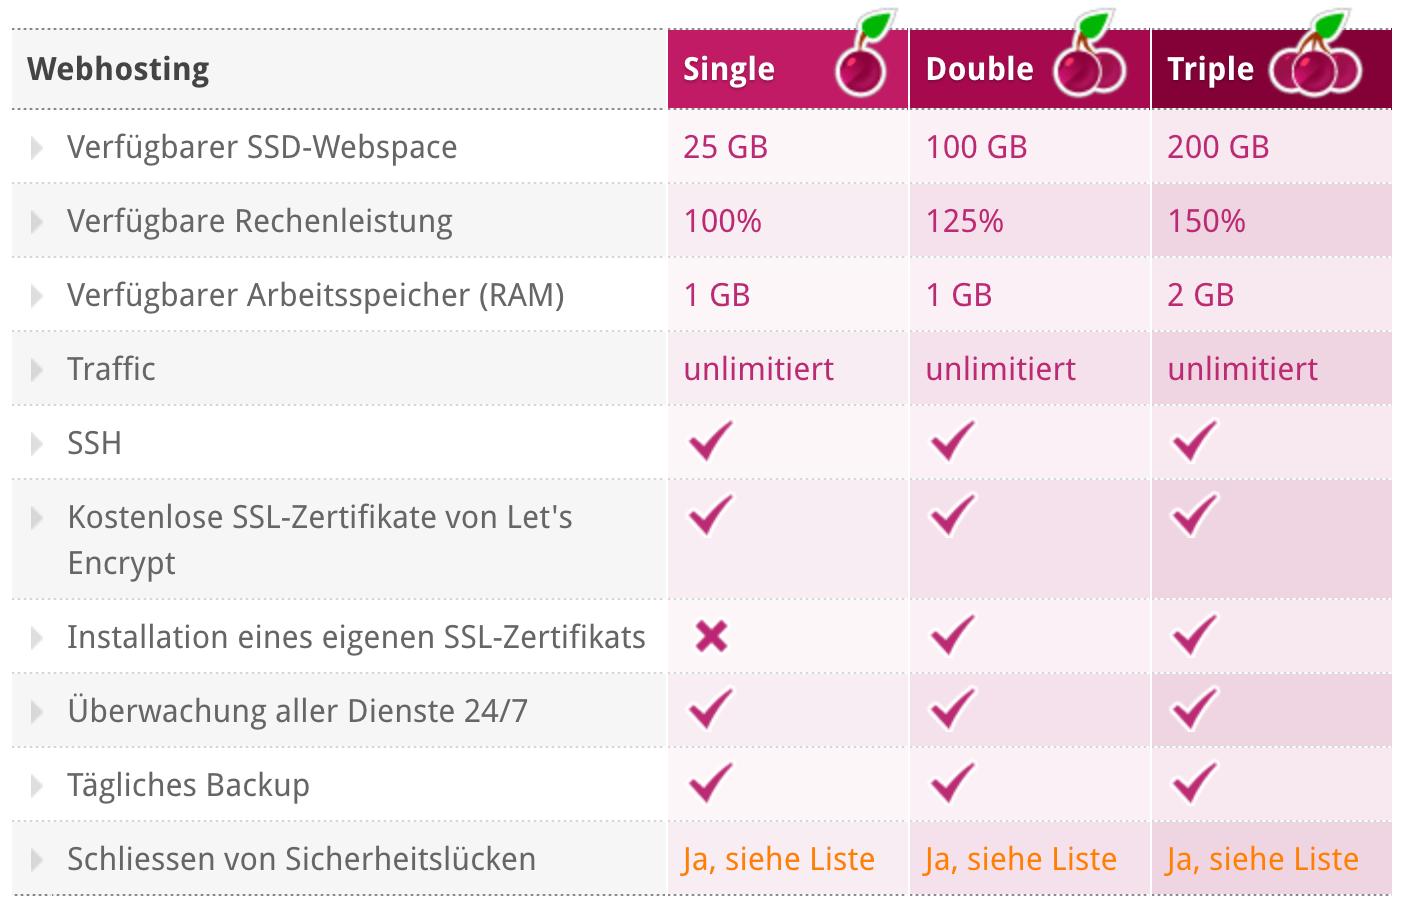 cyon-hosting-schweiz-details